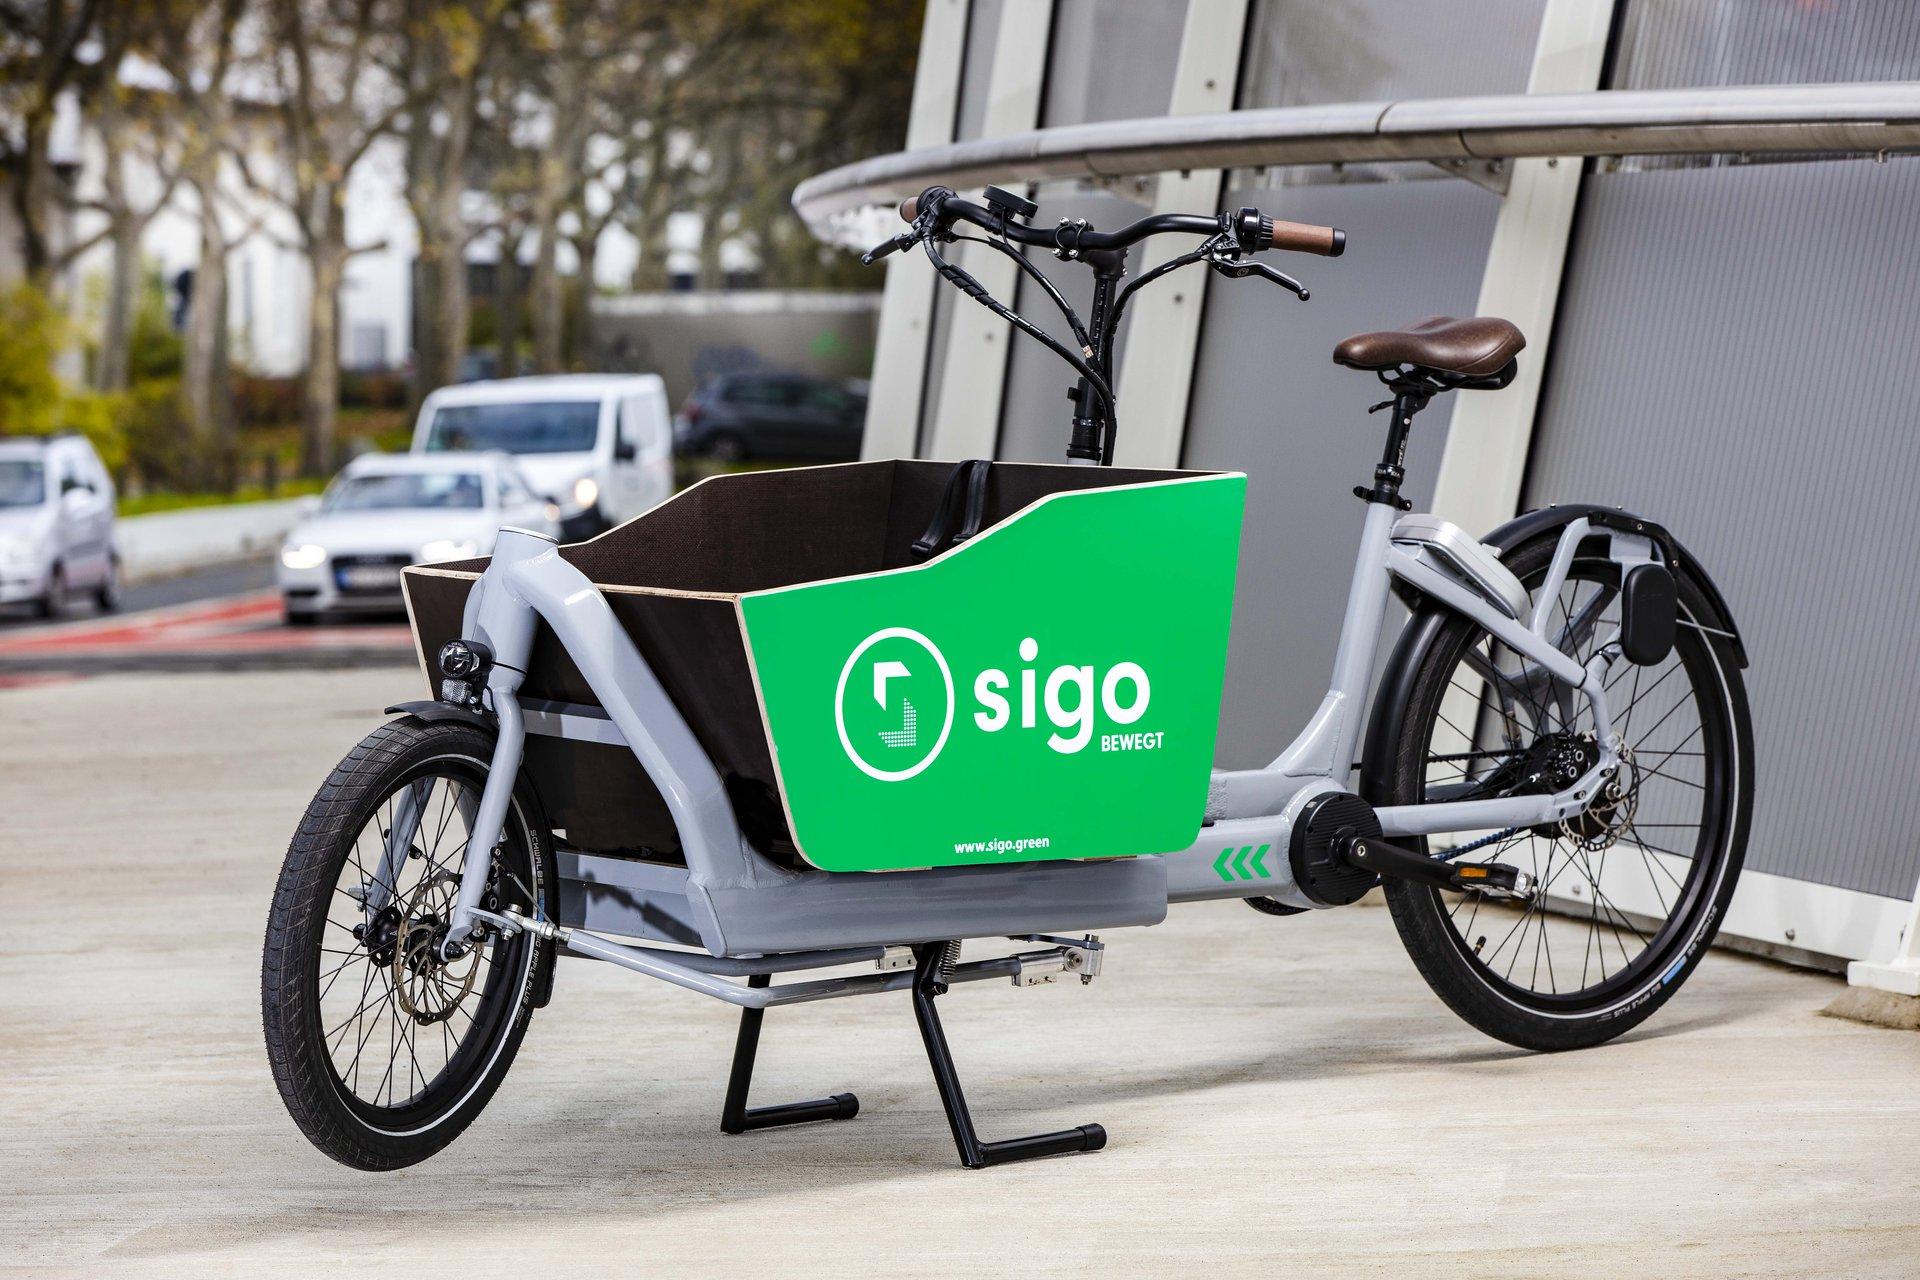 Ein E-Lastenbike von Sigo. Quelle: Sigo GmbH